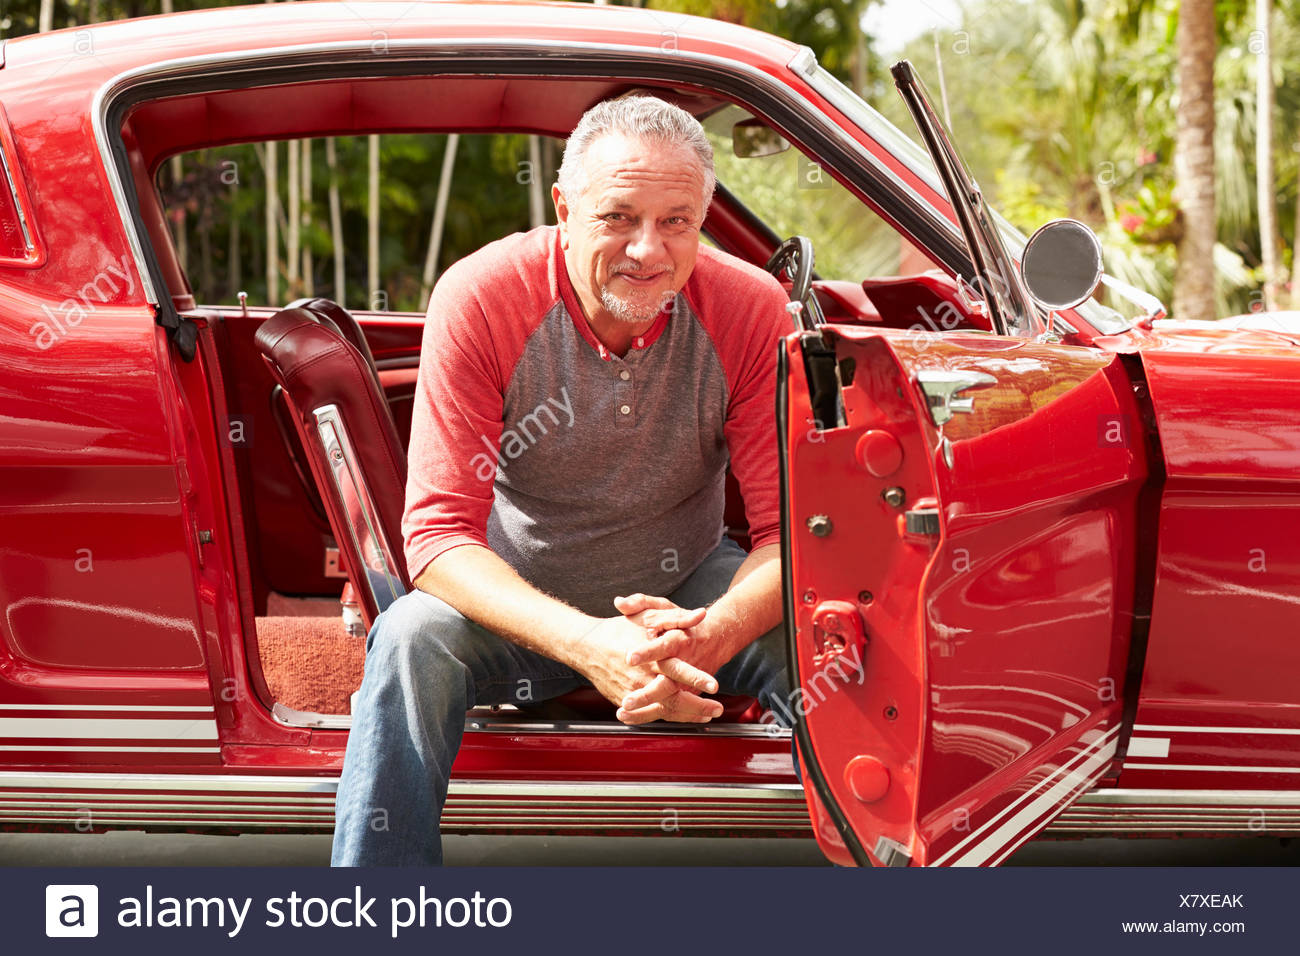 Retired Senior Man Sitting In Restored Classic Car Stock Photo